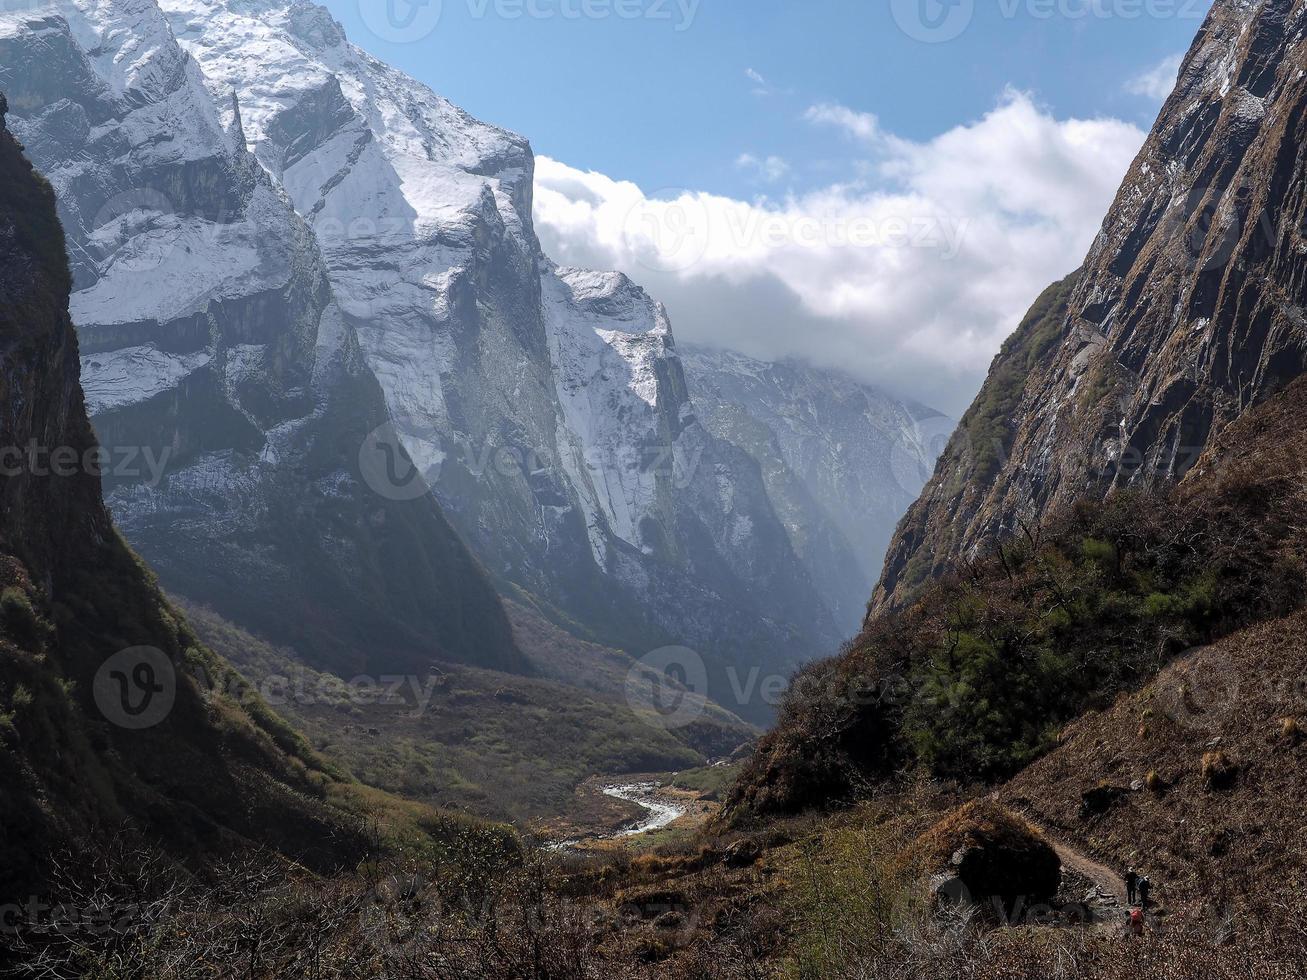 Modi Khola Valley, The Way to Annapurna Base Camp, Nepal photo